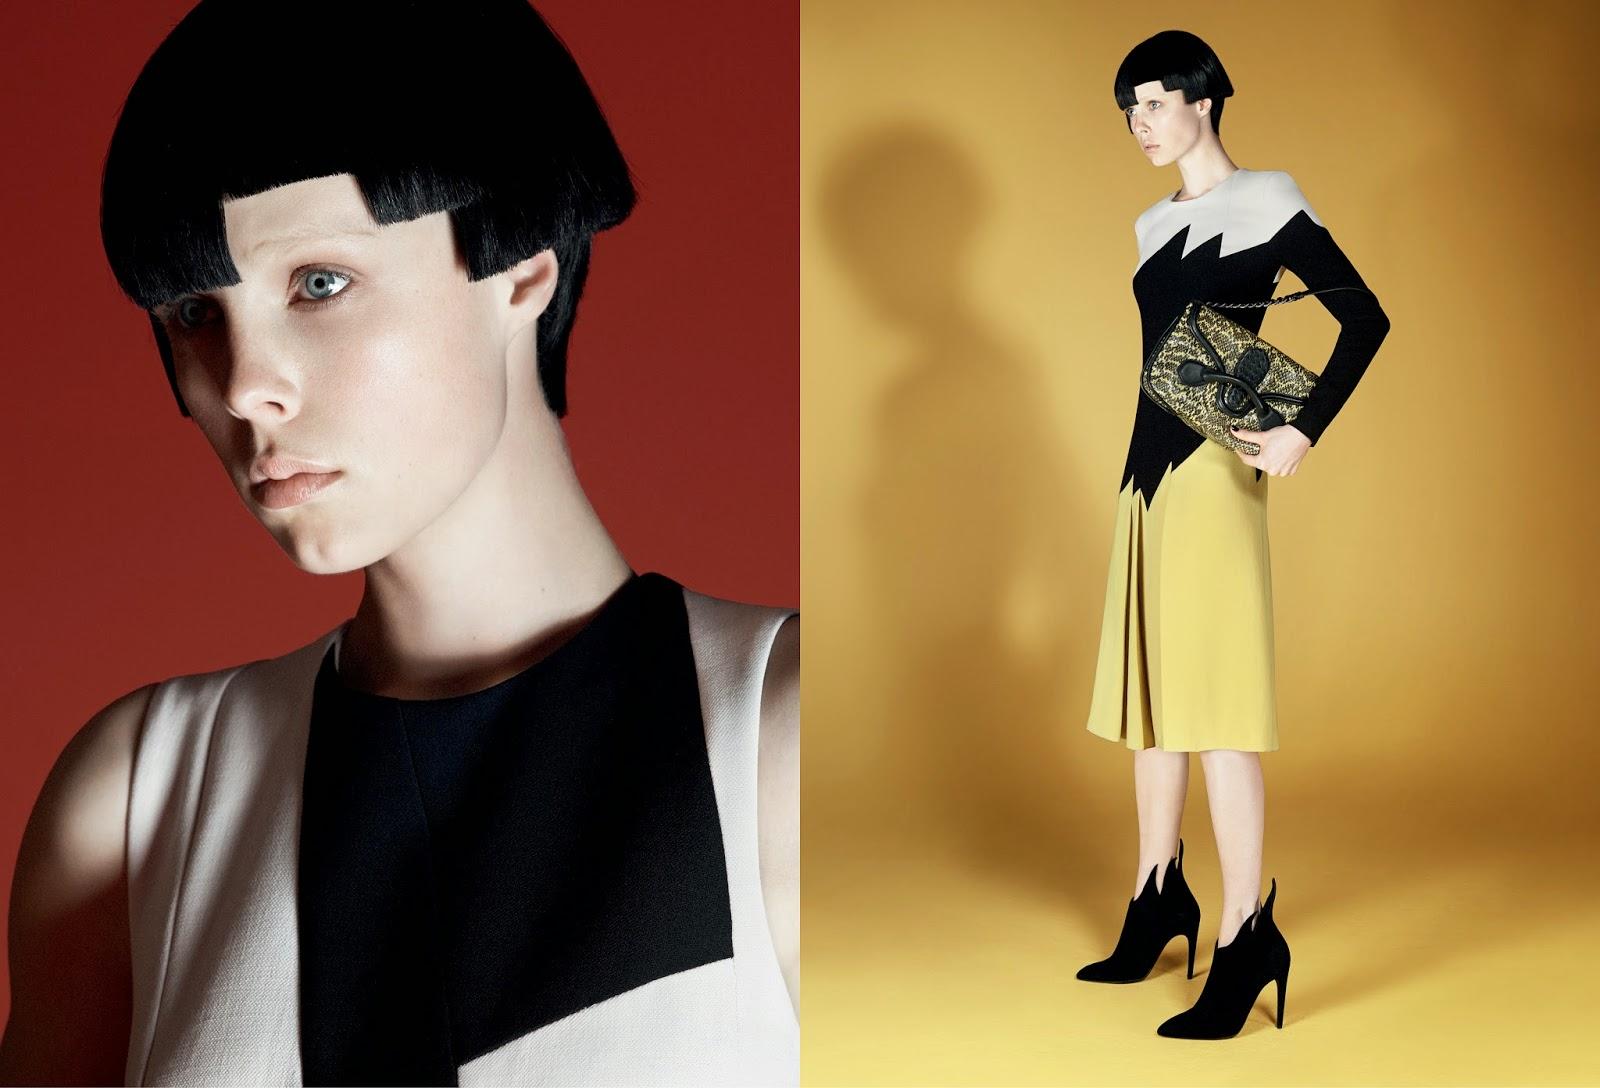 Bottega Veneta Debuts Fall/Winter 2014 Ad Campaign